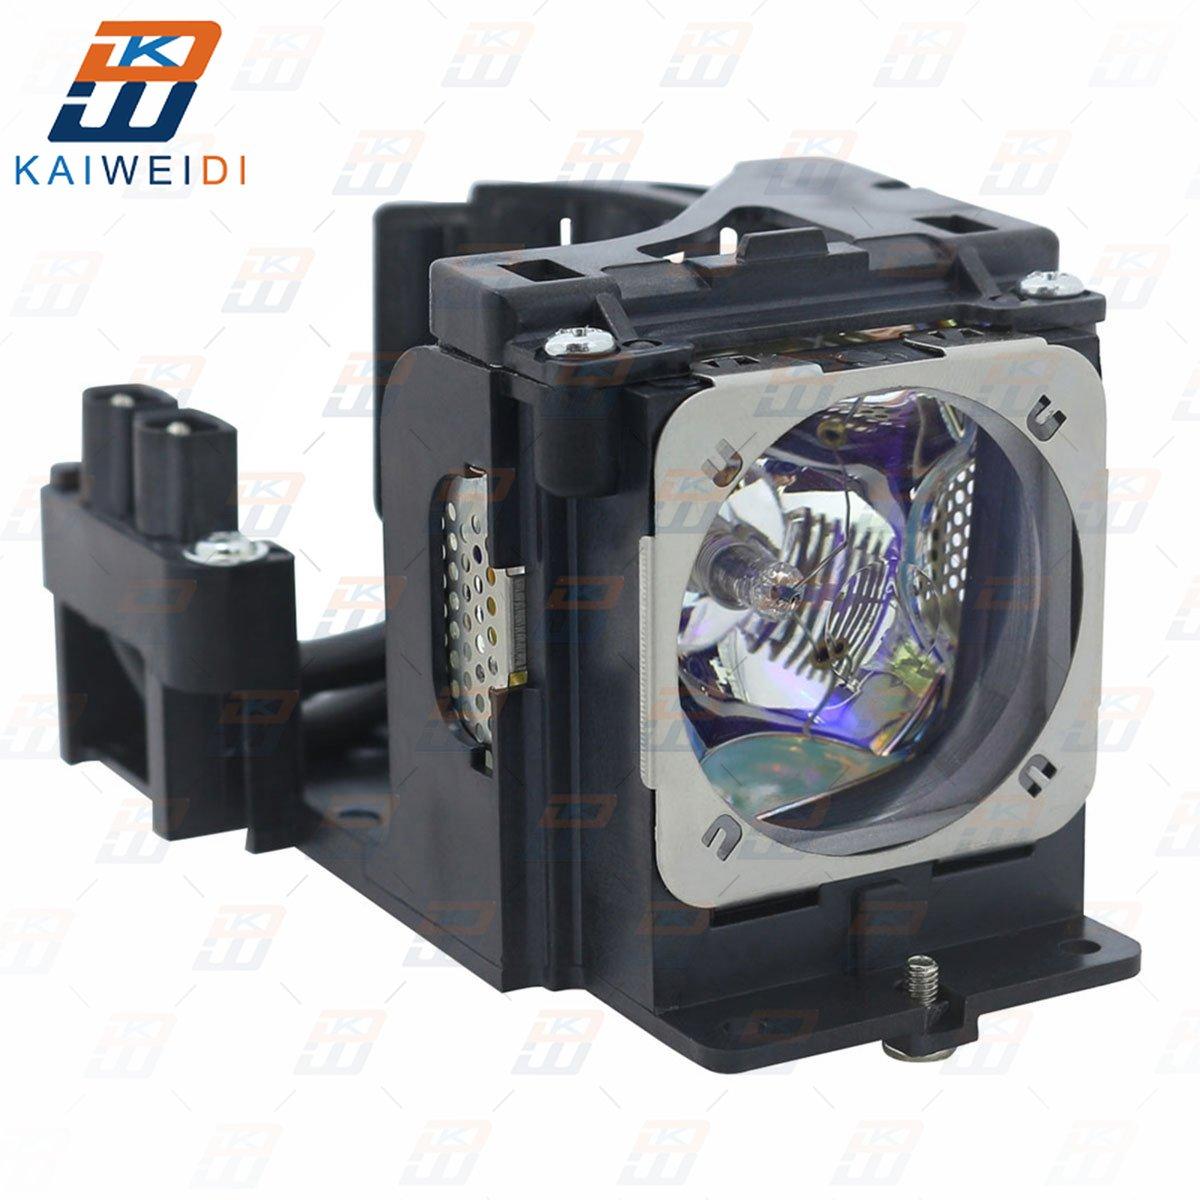 POA-LMP90 POA-LMP106 Replacement Projector Lamp For Sanyo PLC-SU70 PLC-XE40 PLC-XU2530C PLC-XU73 PLC-XU74 XU76 XU83 XU84 XU86